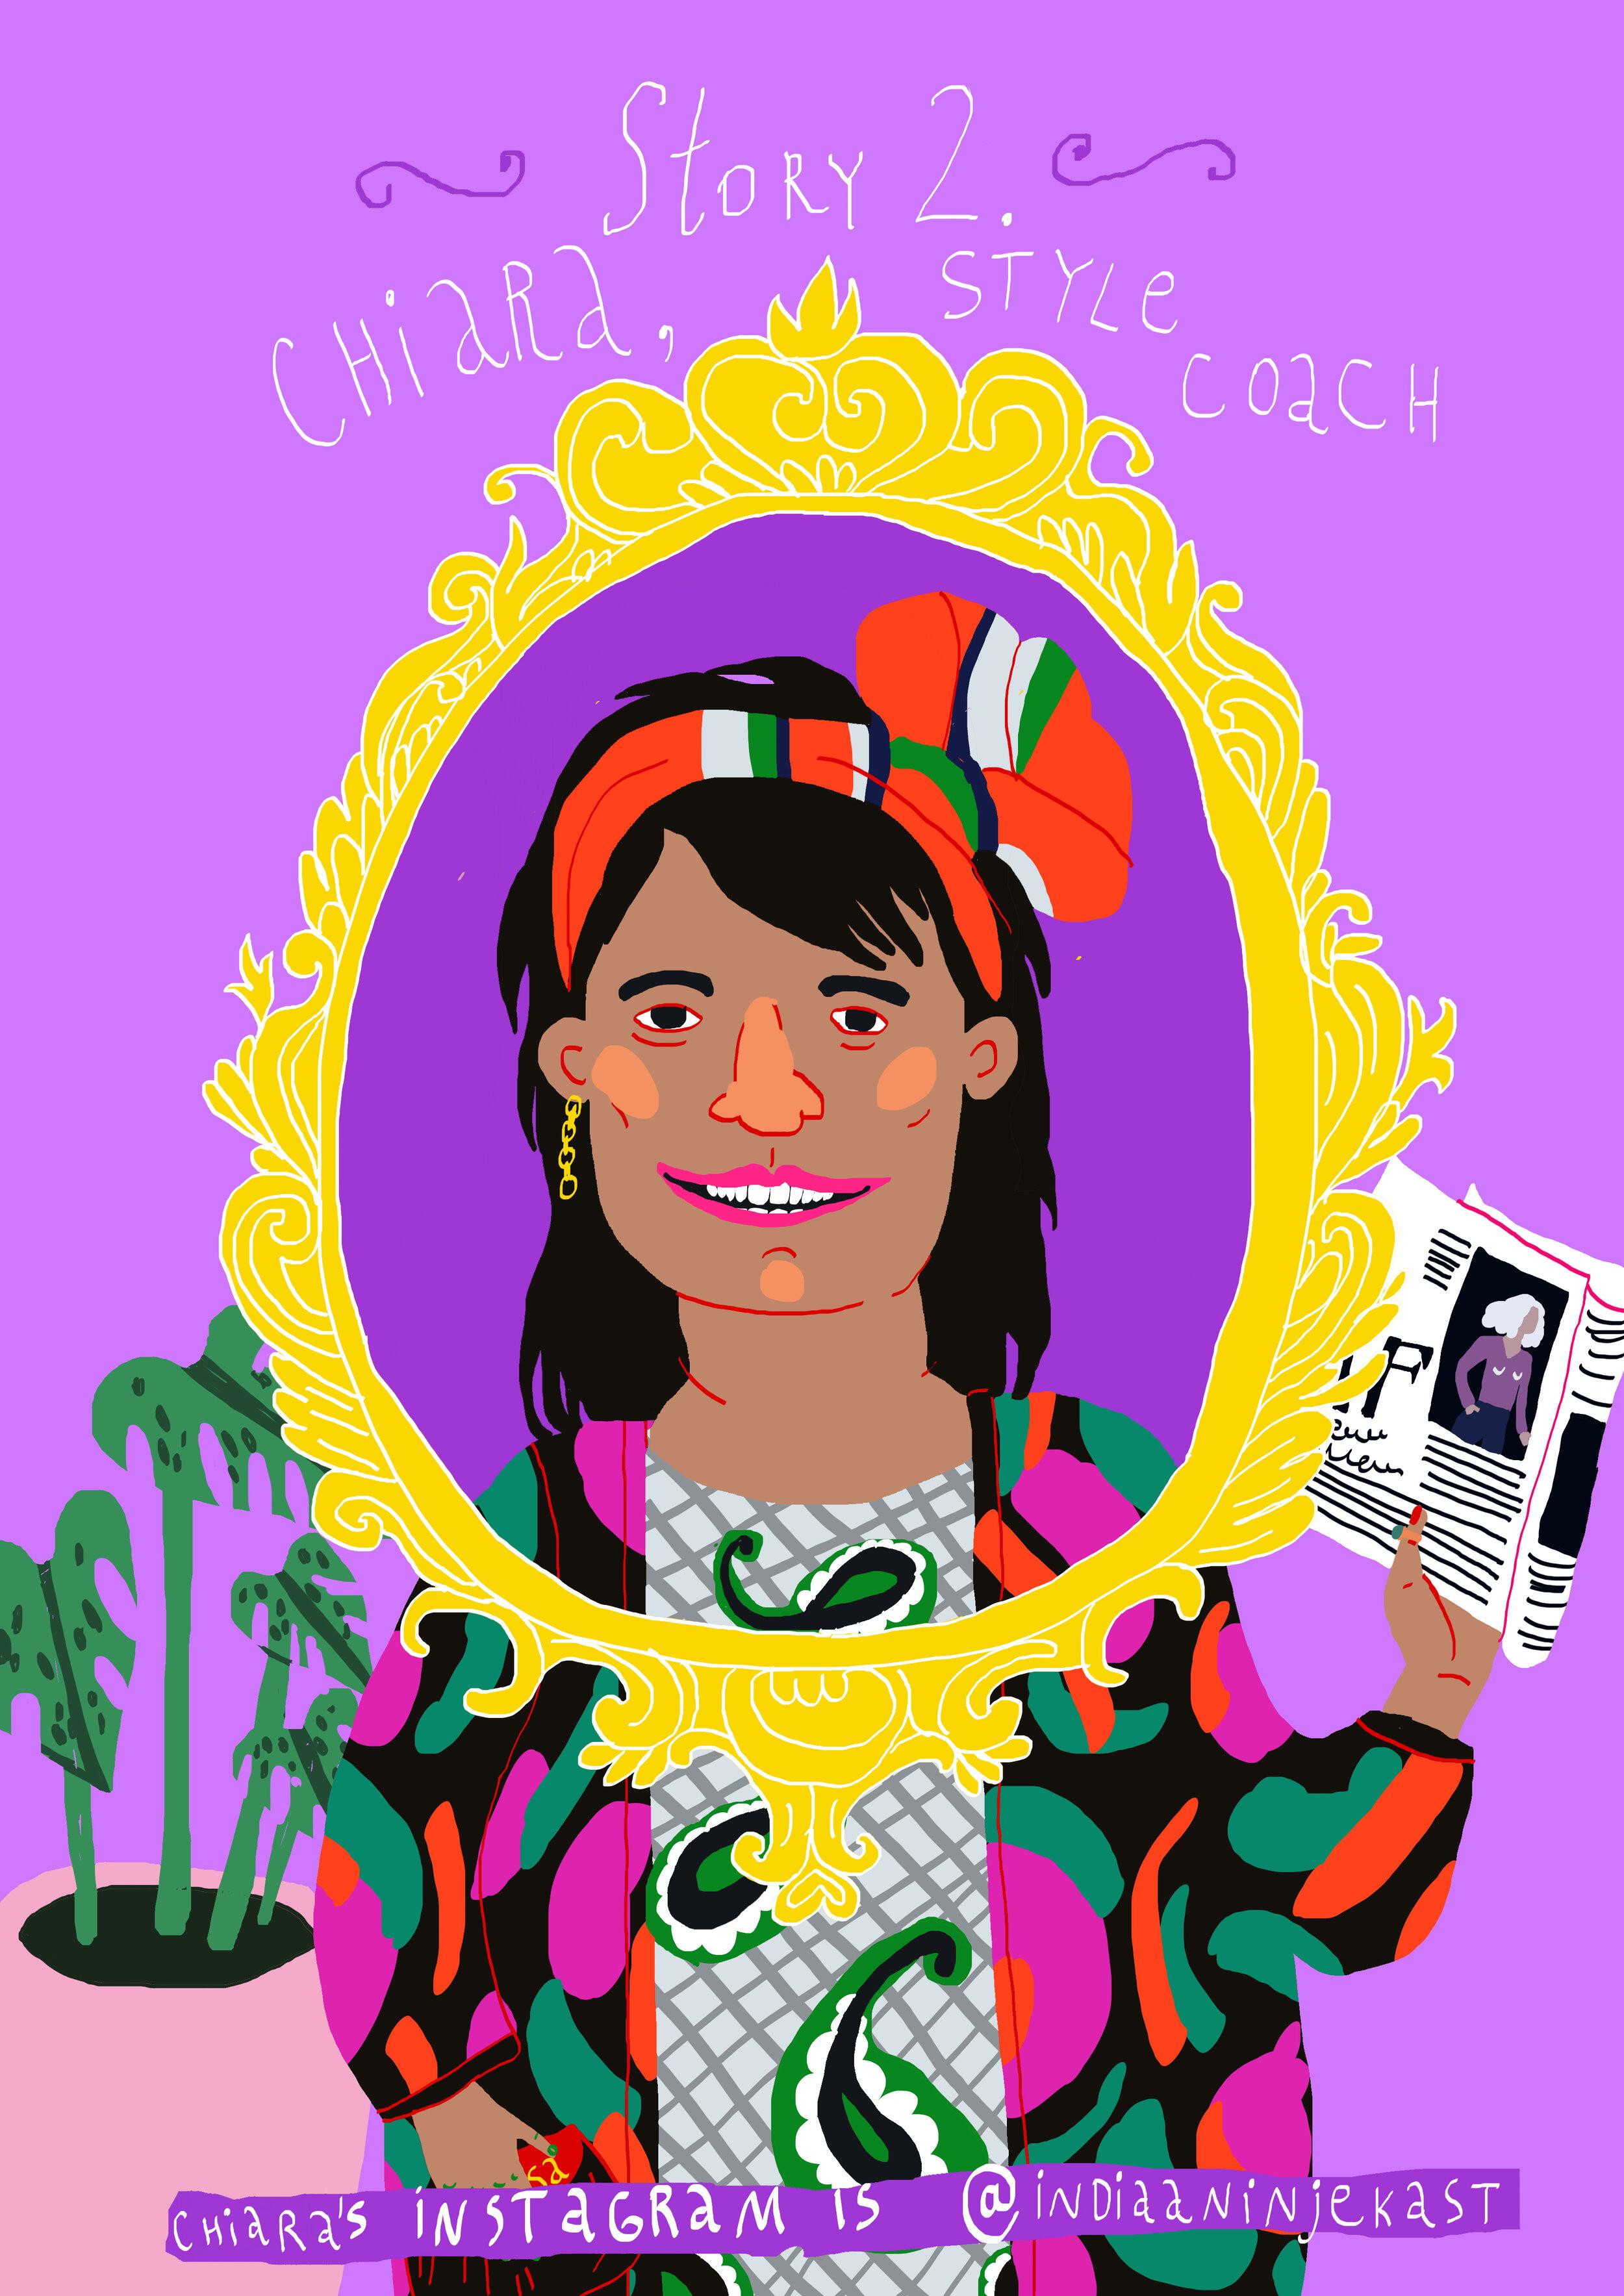 story of Chiara cover.jpg